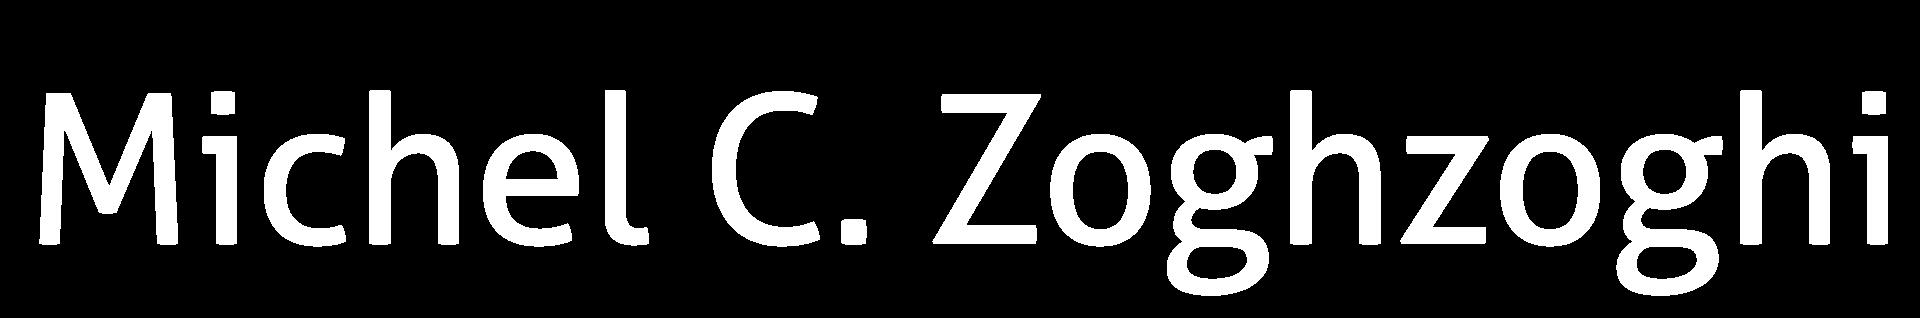 Michel Zoghzoghi